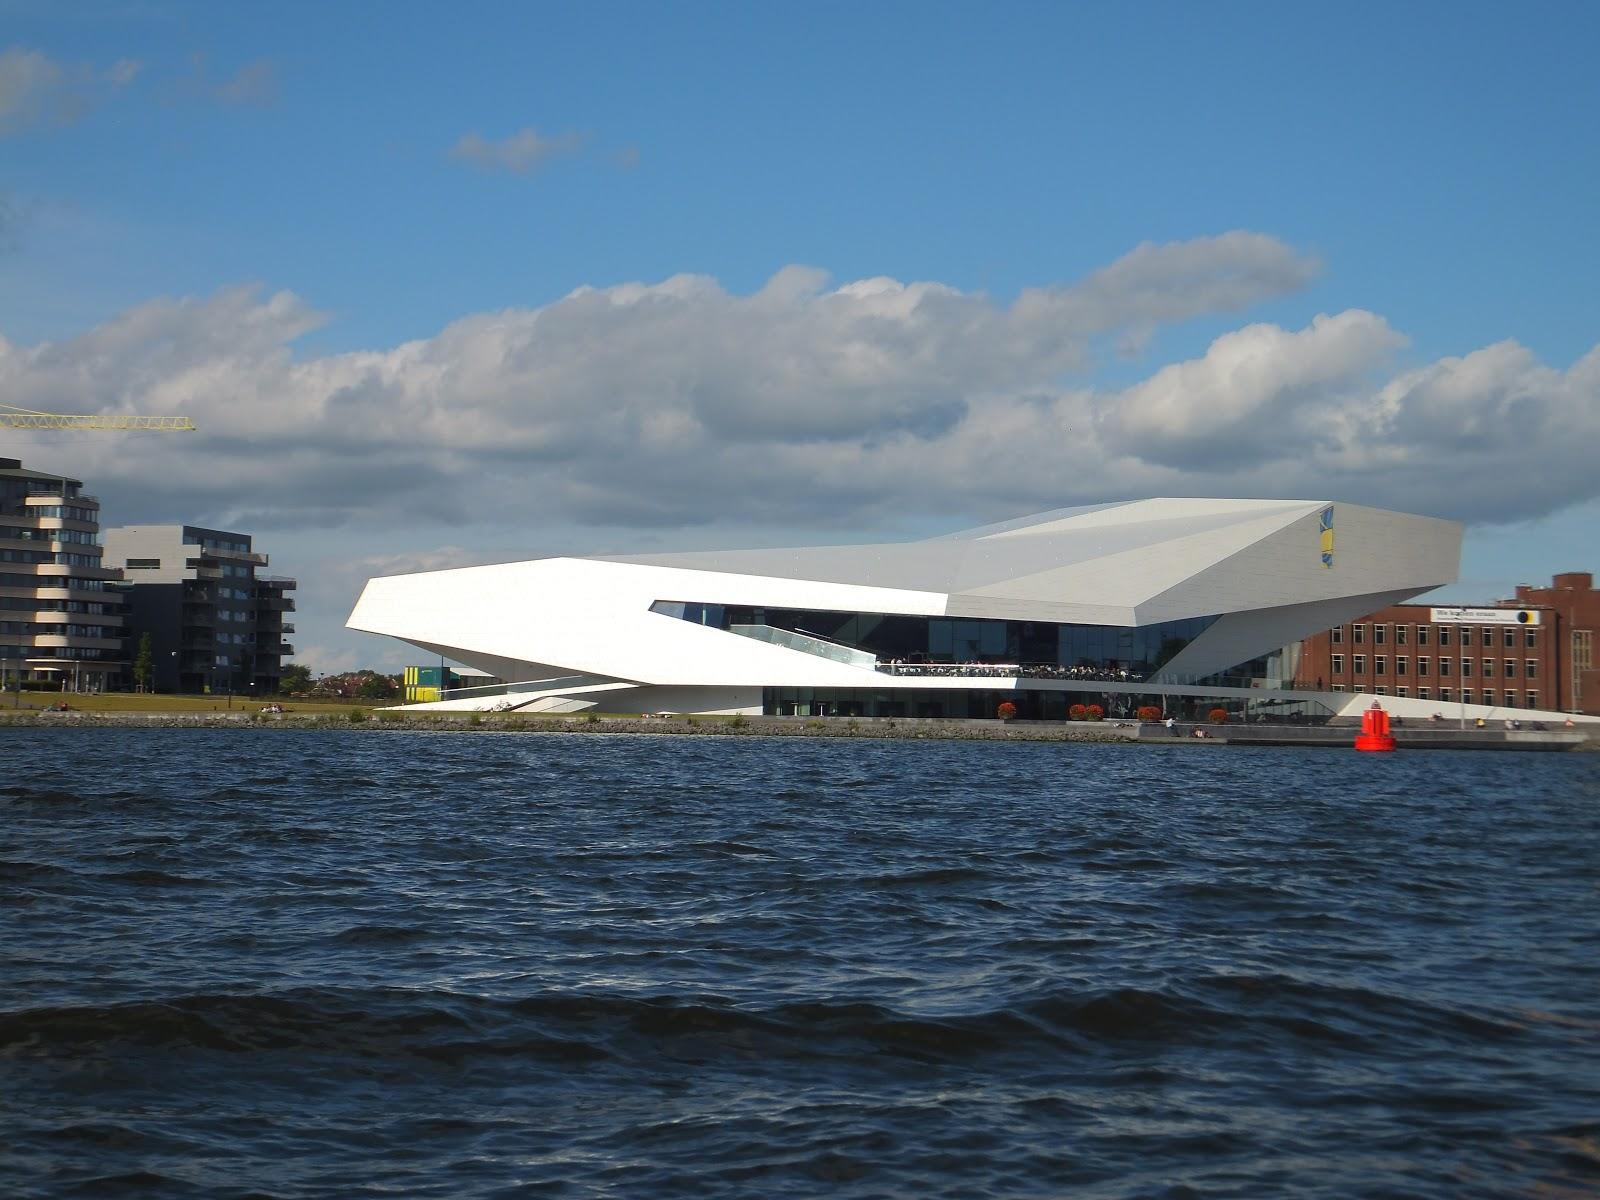 Viaje a Amsterdam, Holanda, Países Bajos, Elisa N, Blog de Viajes, Lifestyle, Travel